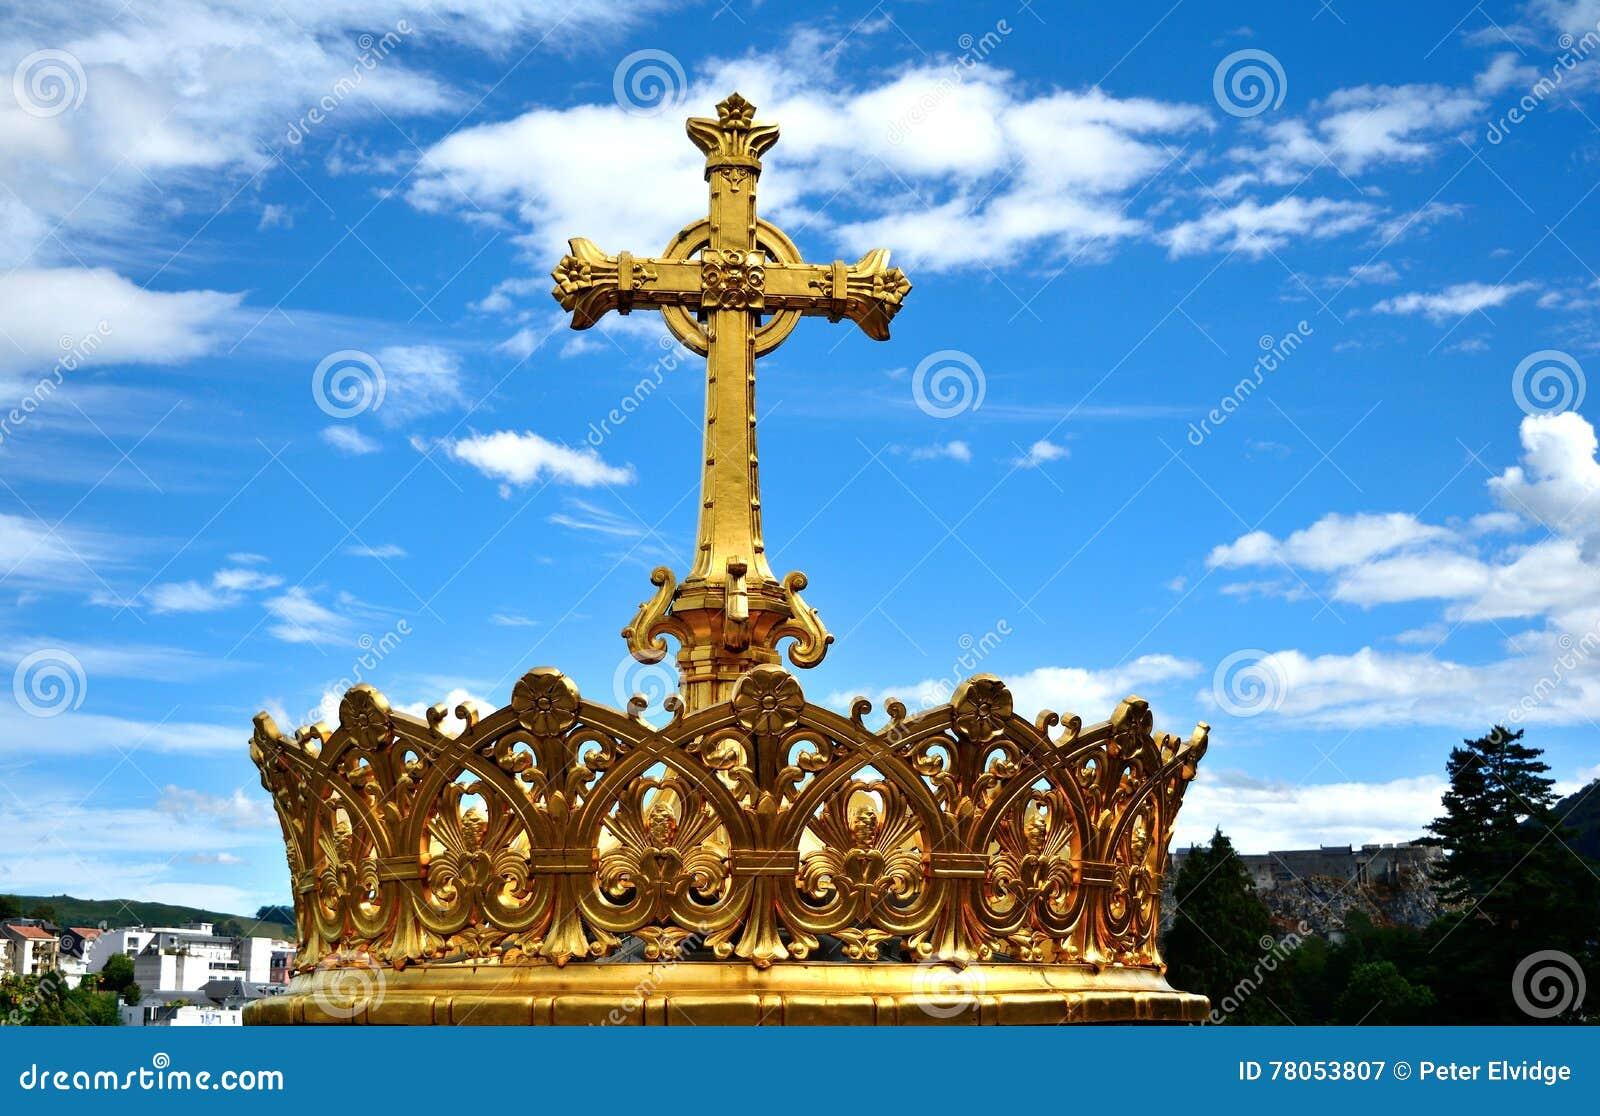 Cruz Santa De La Iglesia Católica Contra El Cielo Azul Imagen de ...